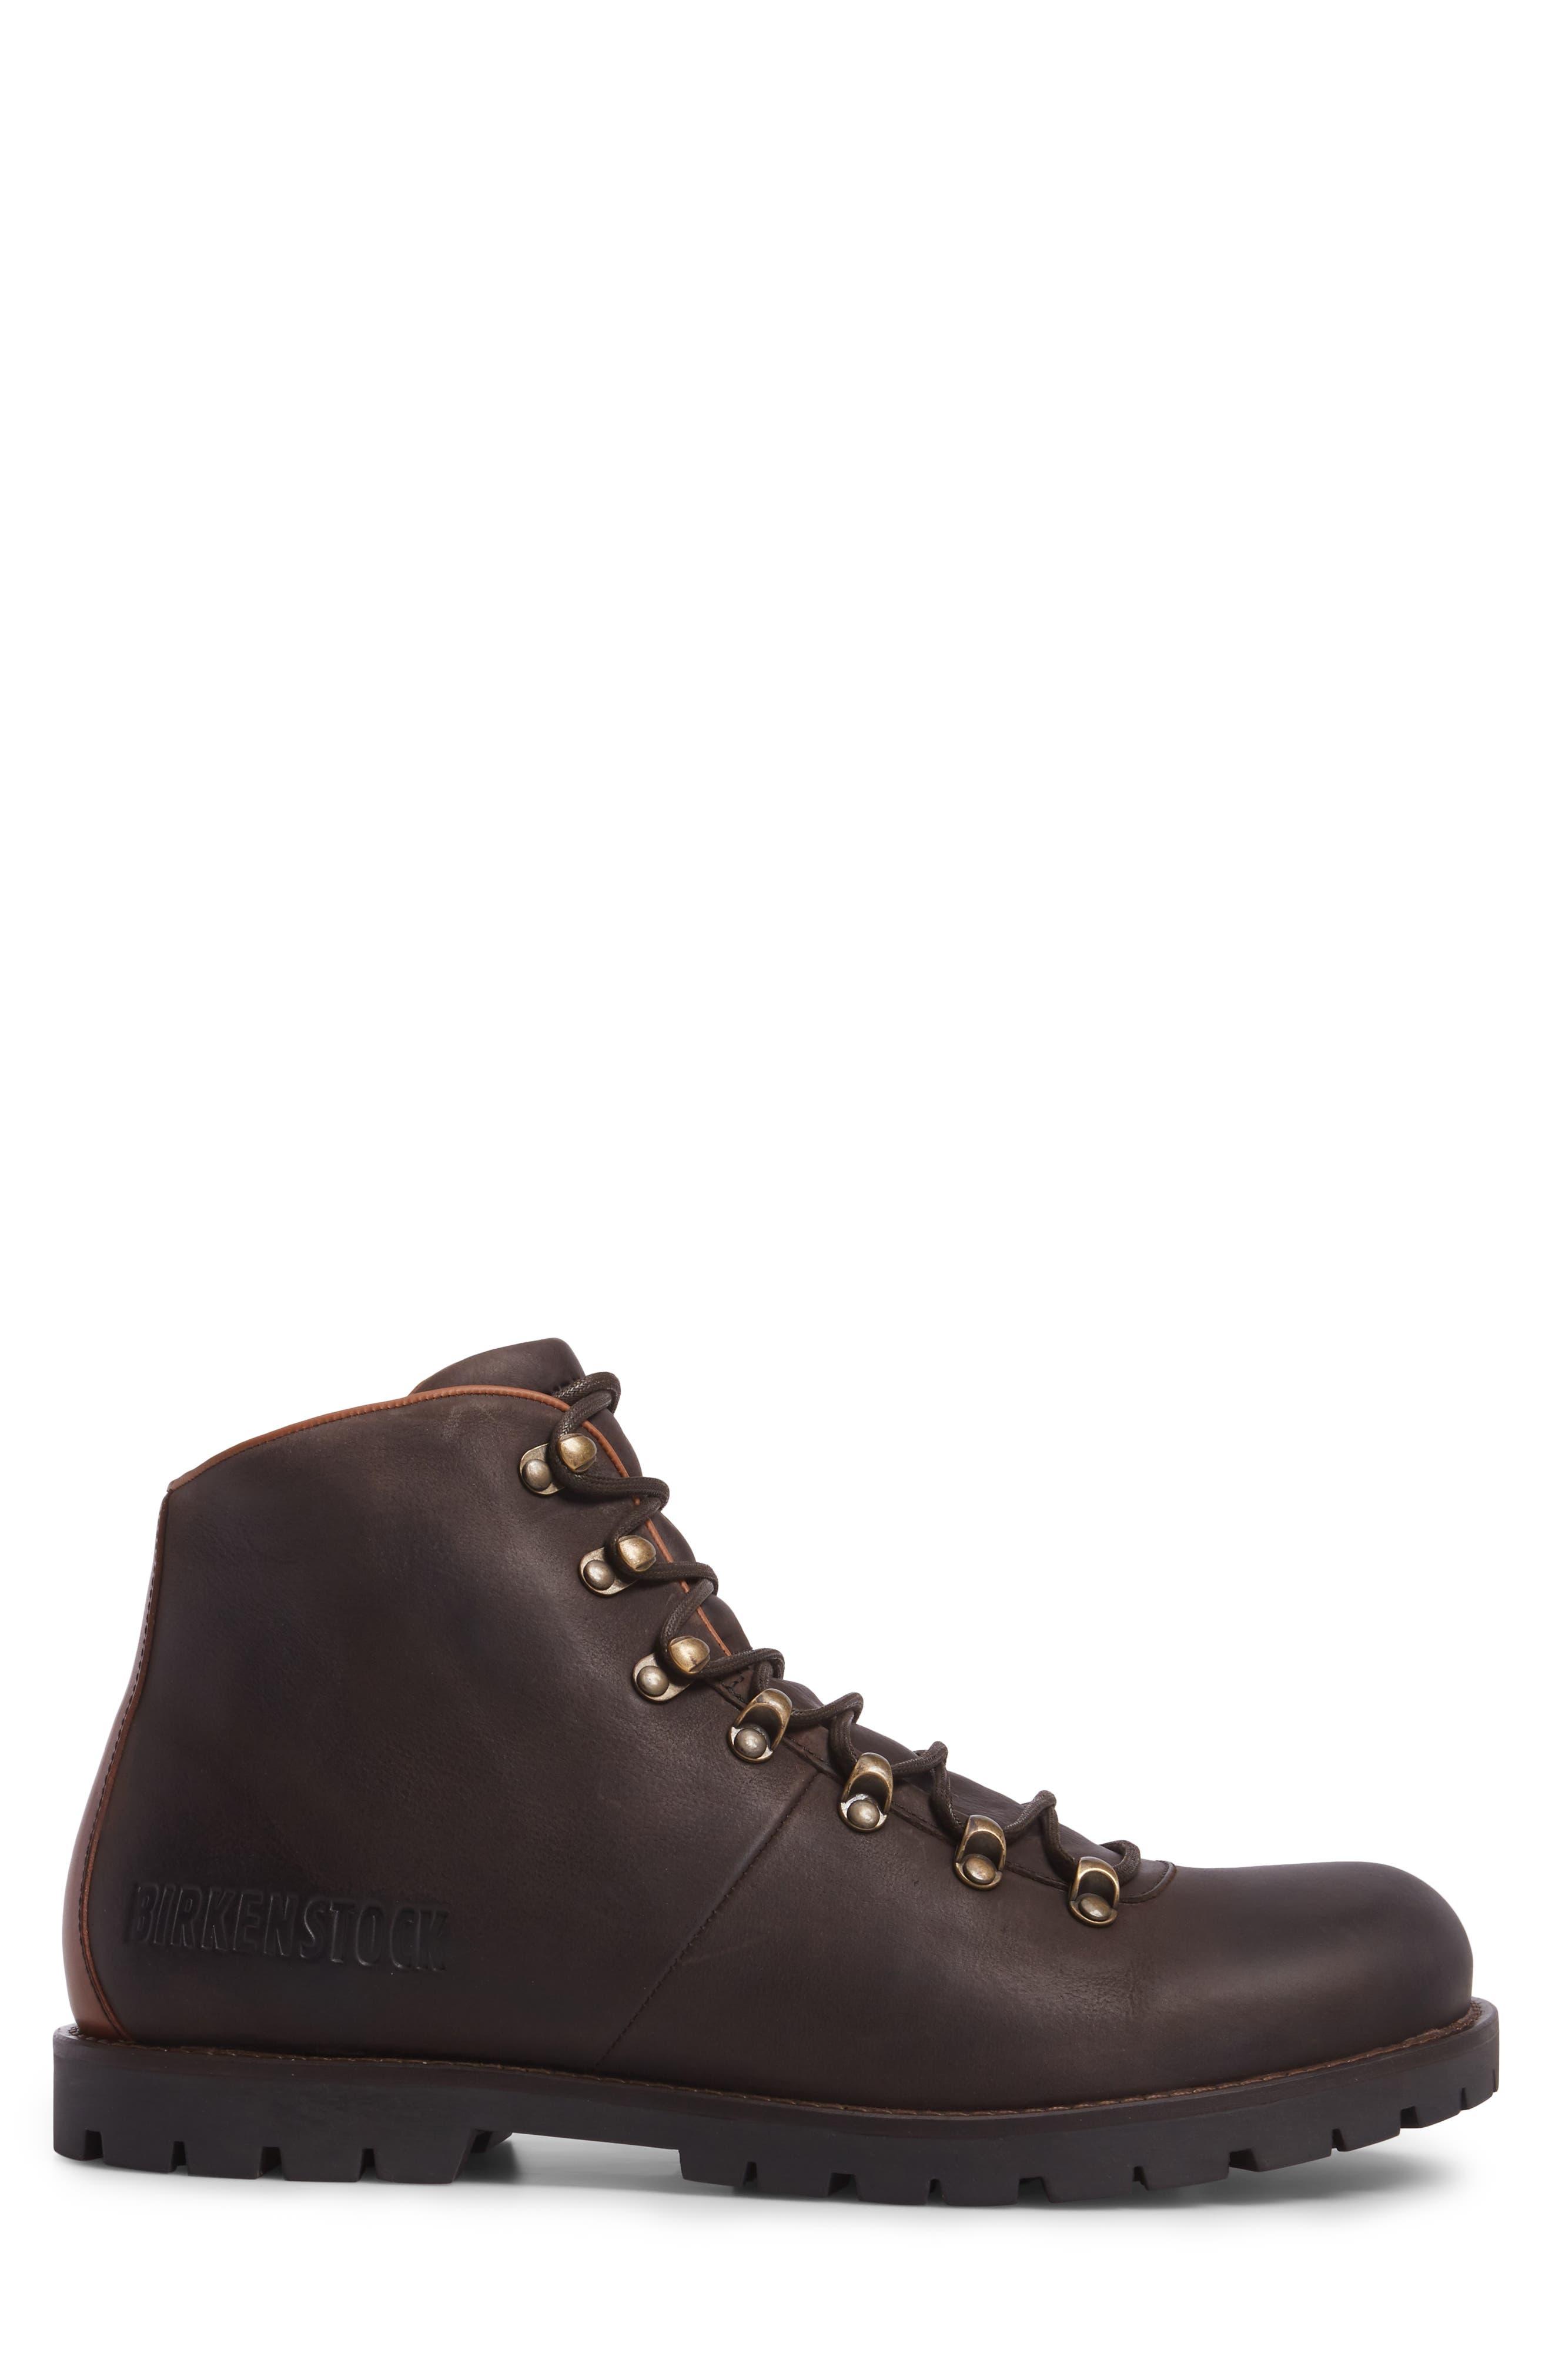 Hancock Plain Toe Boot,                             Alternate thumbnail 3, color,                             Dark Brown